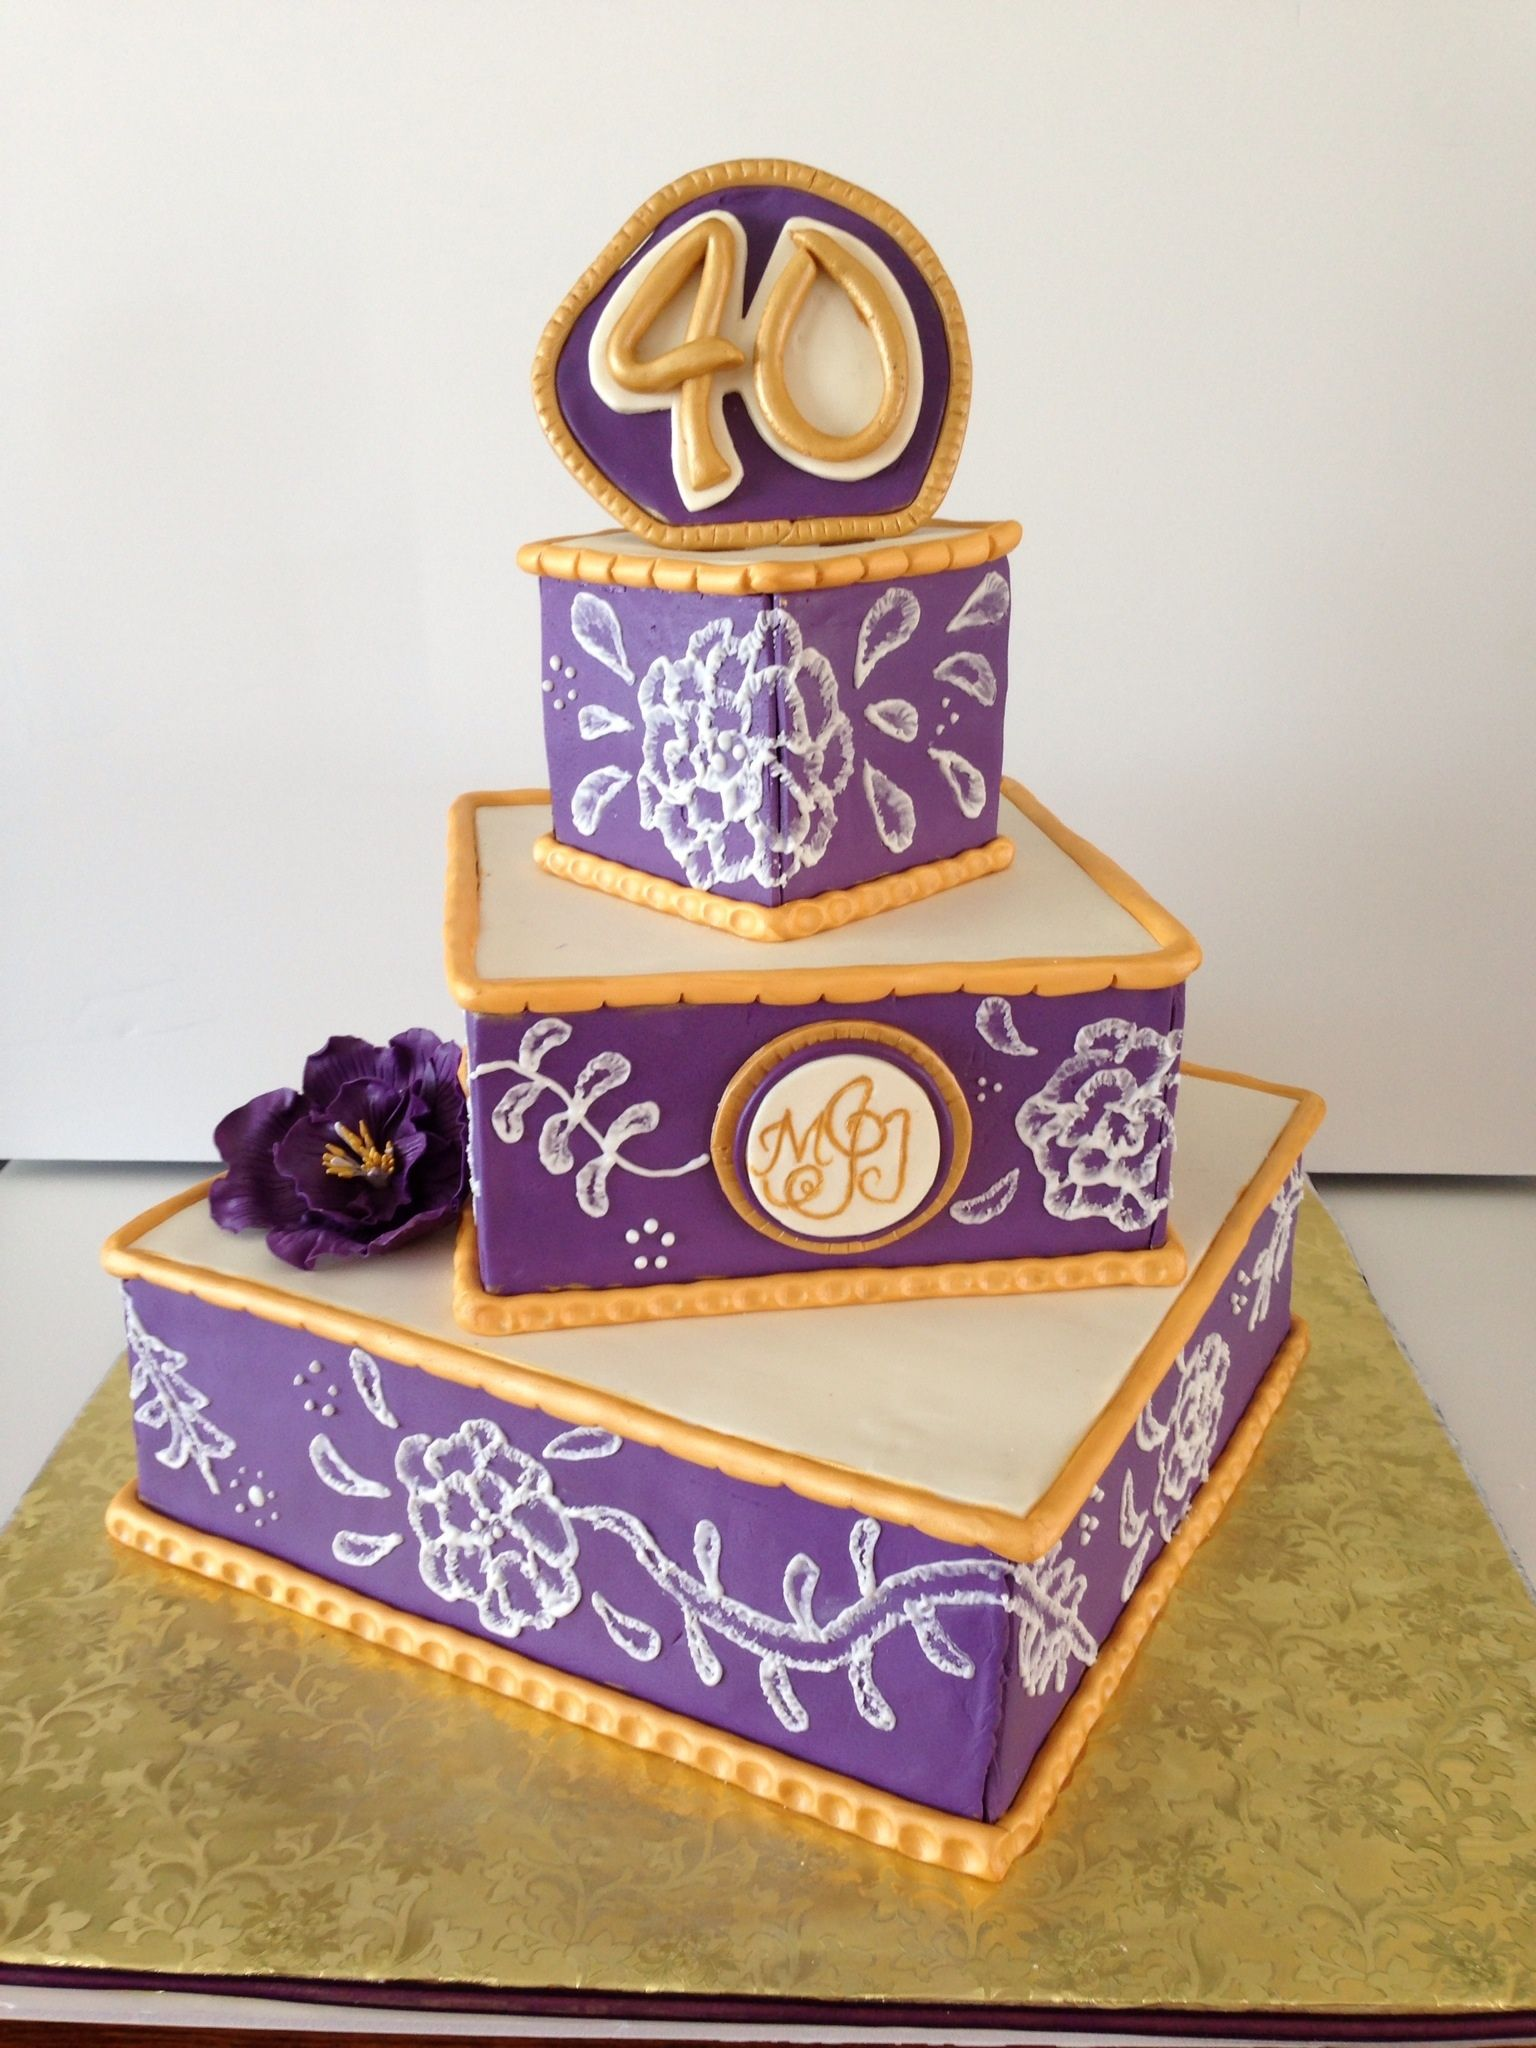 Decoration ideas for 40th wedding anniversary  th Wedding Anniversay  I made this for my inlaws anniversary I